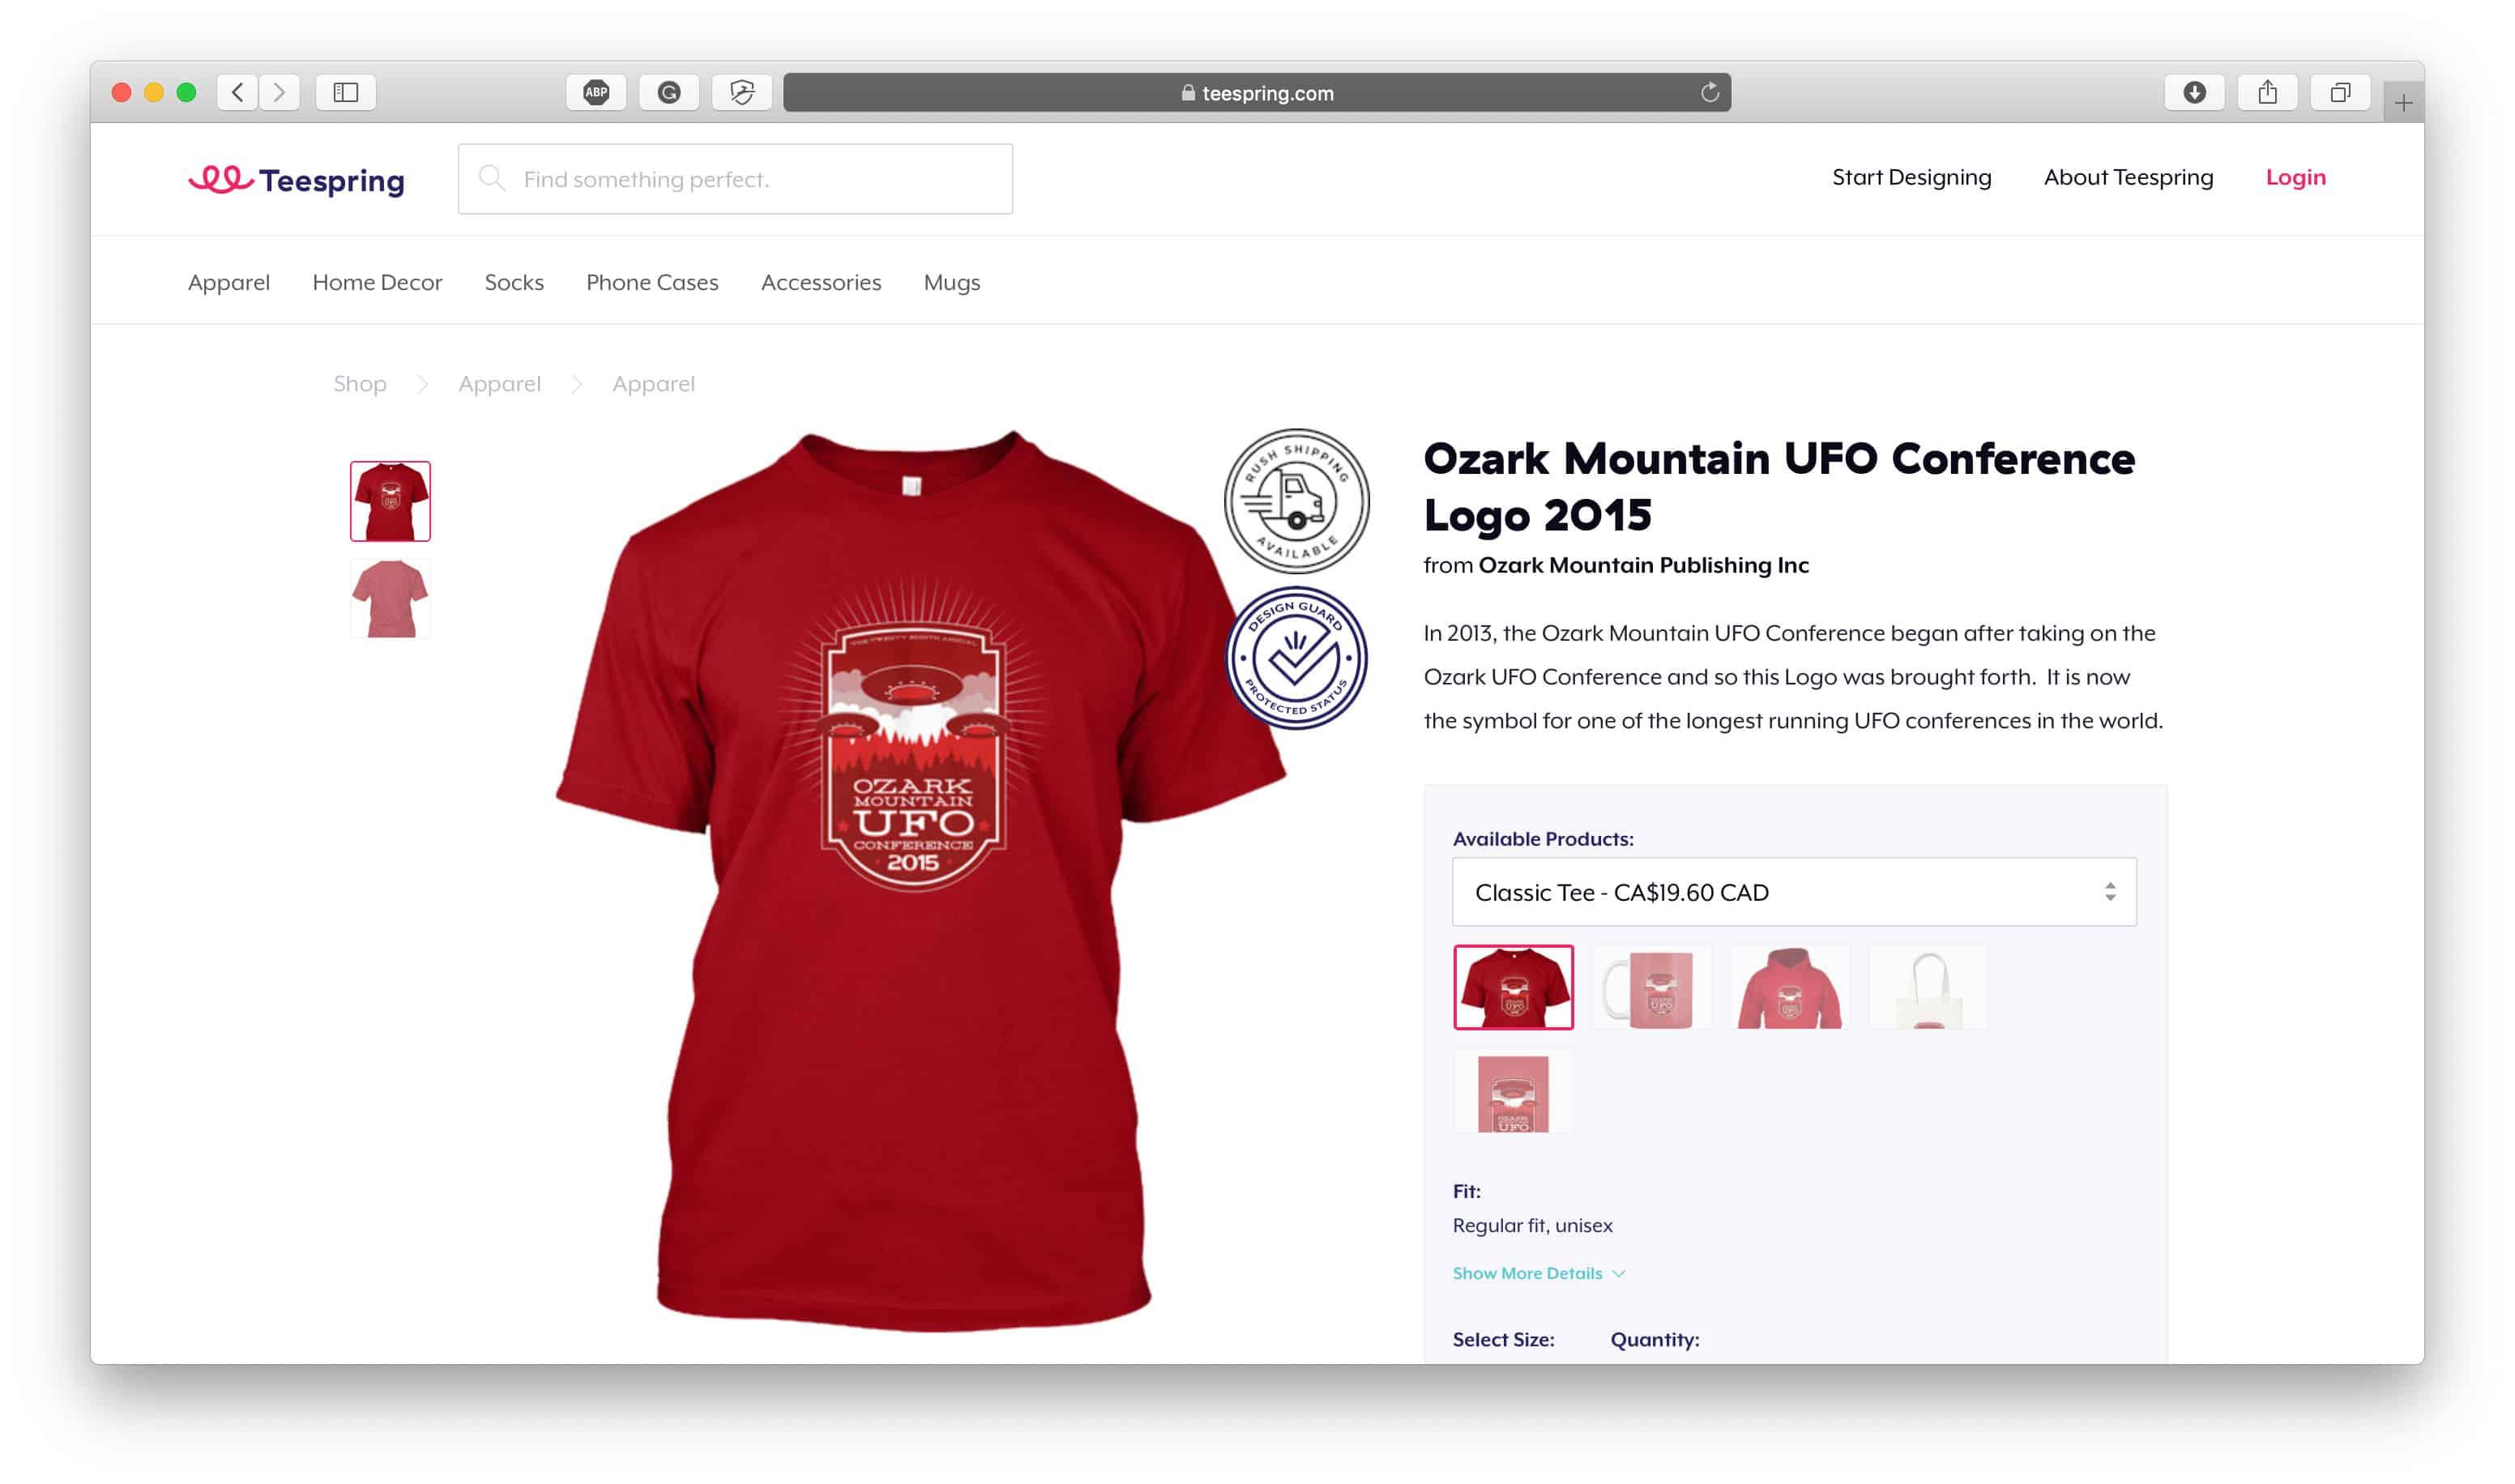 Branded T-Shirt Designs